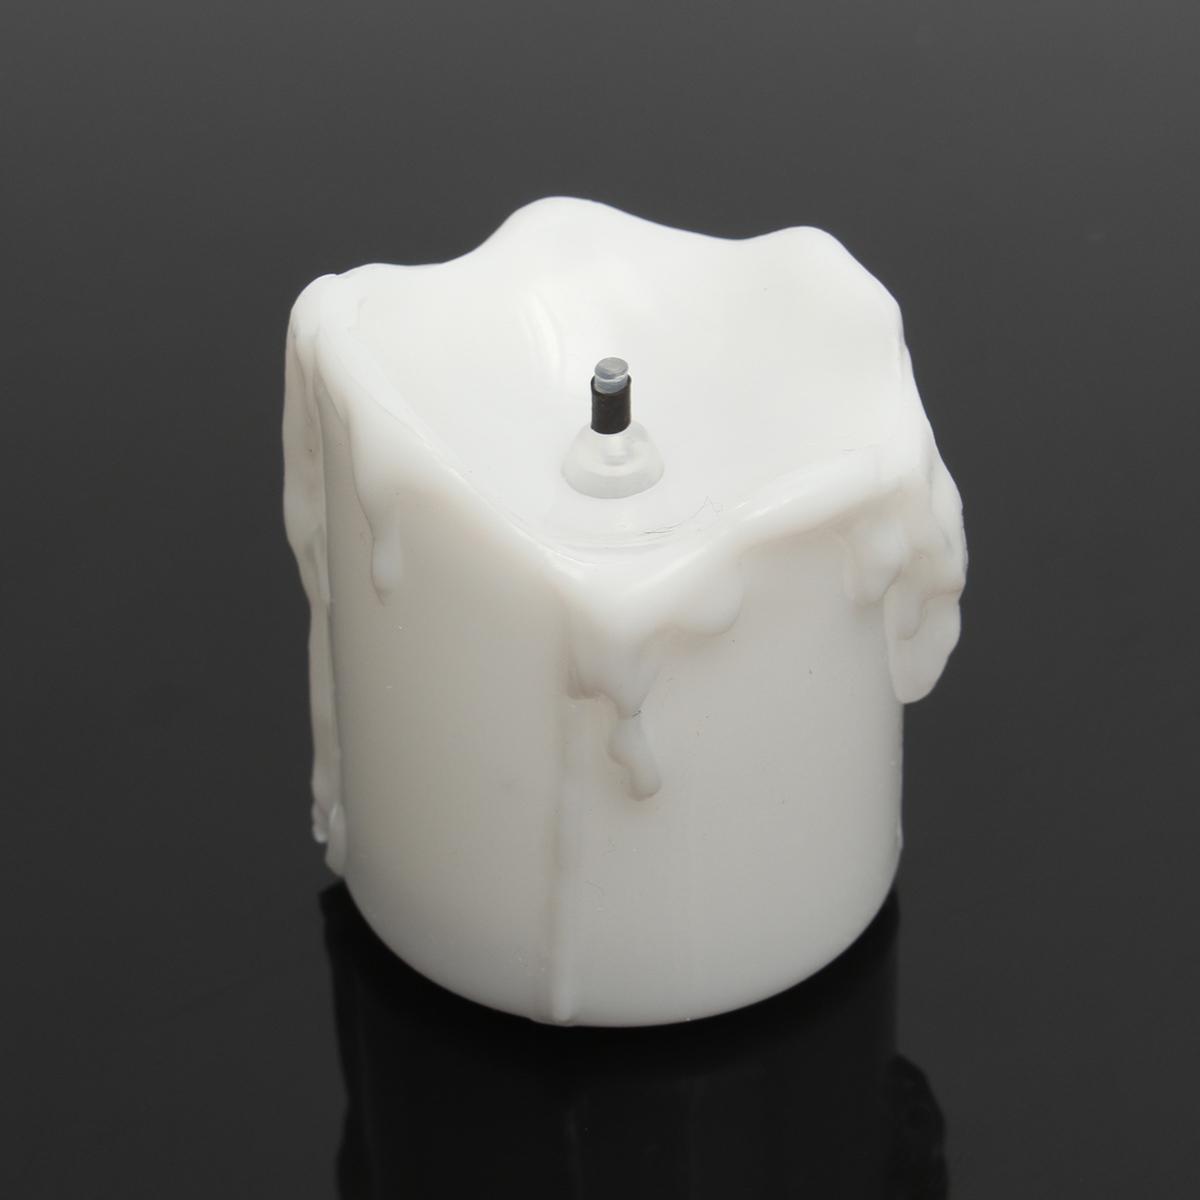 4.3*4.5cm battery powered flameless led candle tea night light